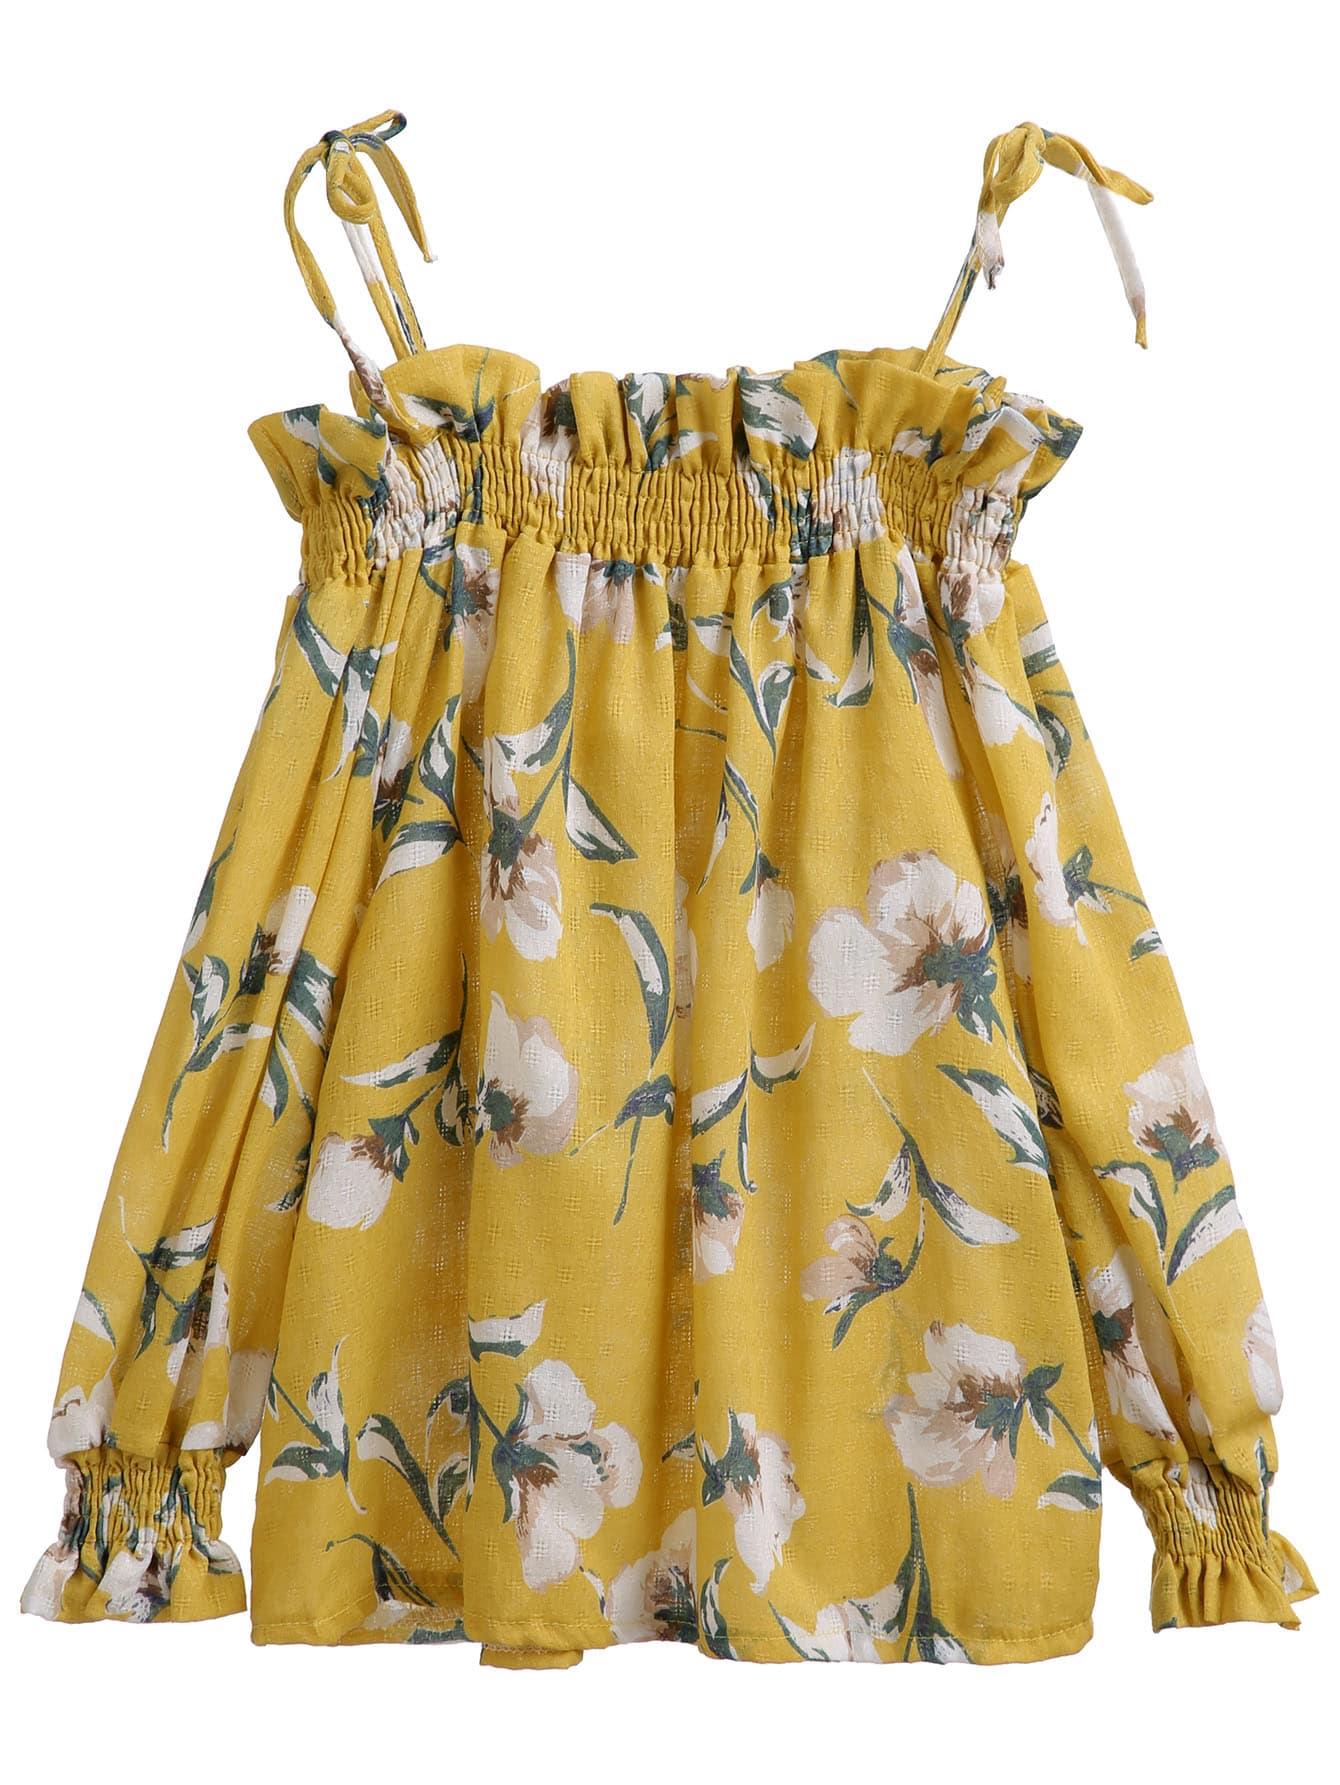 blouse160913110_2